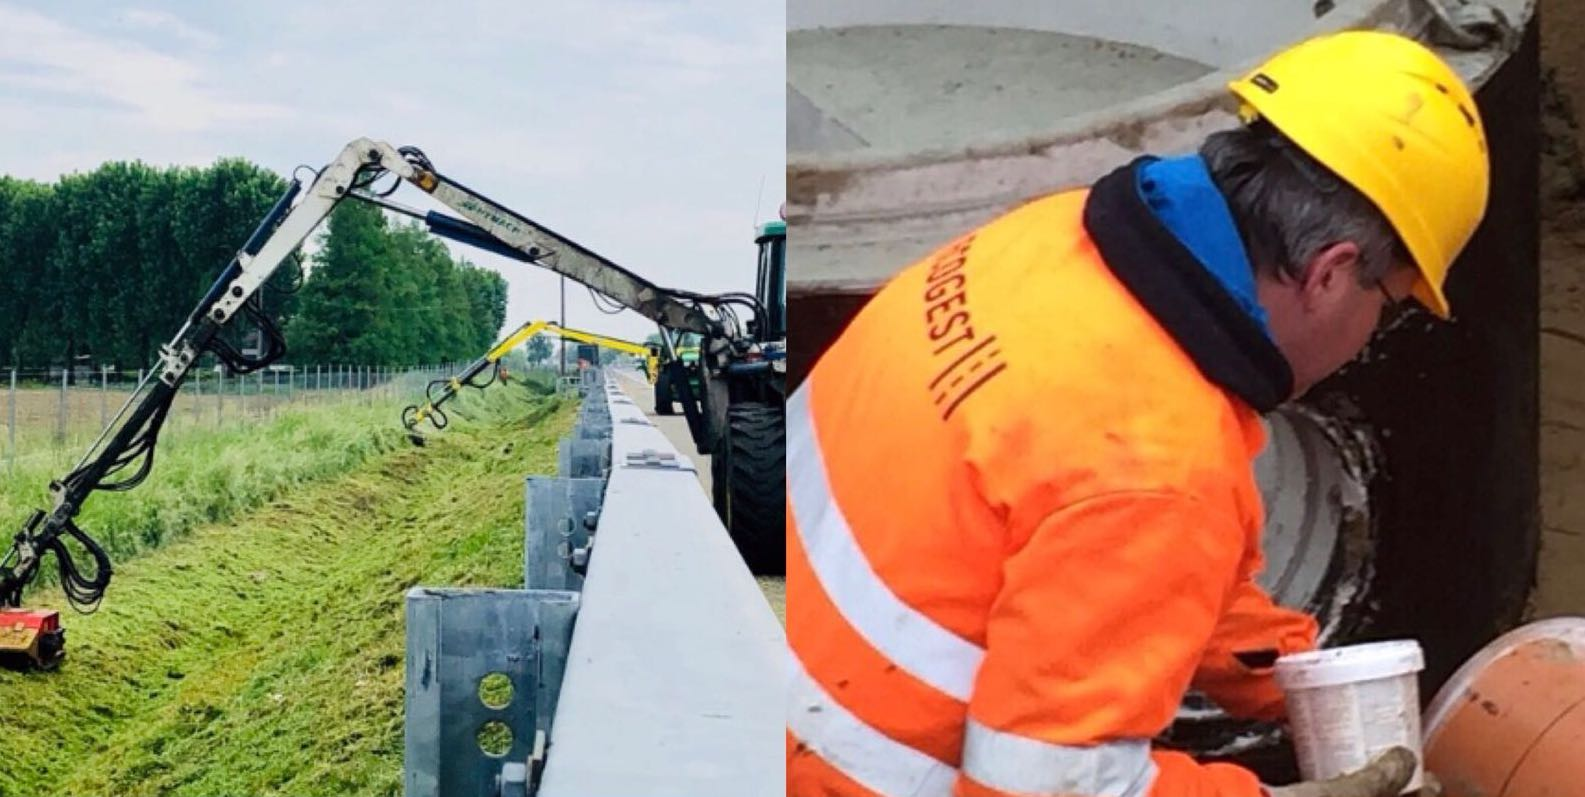 Piena operatività per Ecogest sui cantieri italiani ed esteri